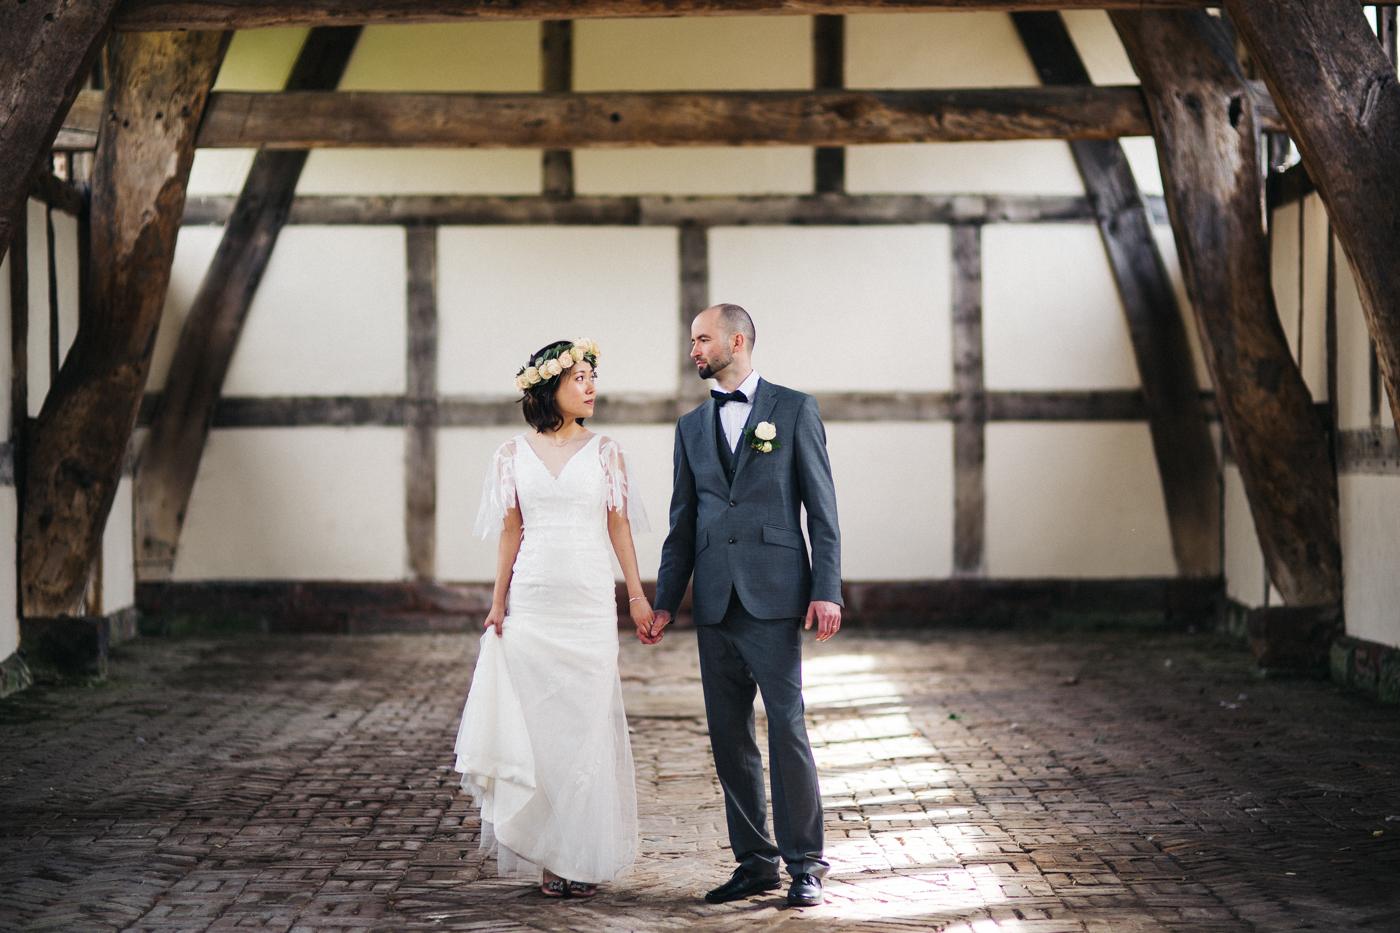 teesside-middlesbrough-north-east-wedding-photographer-creative-wedding-venues-0033.jpg